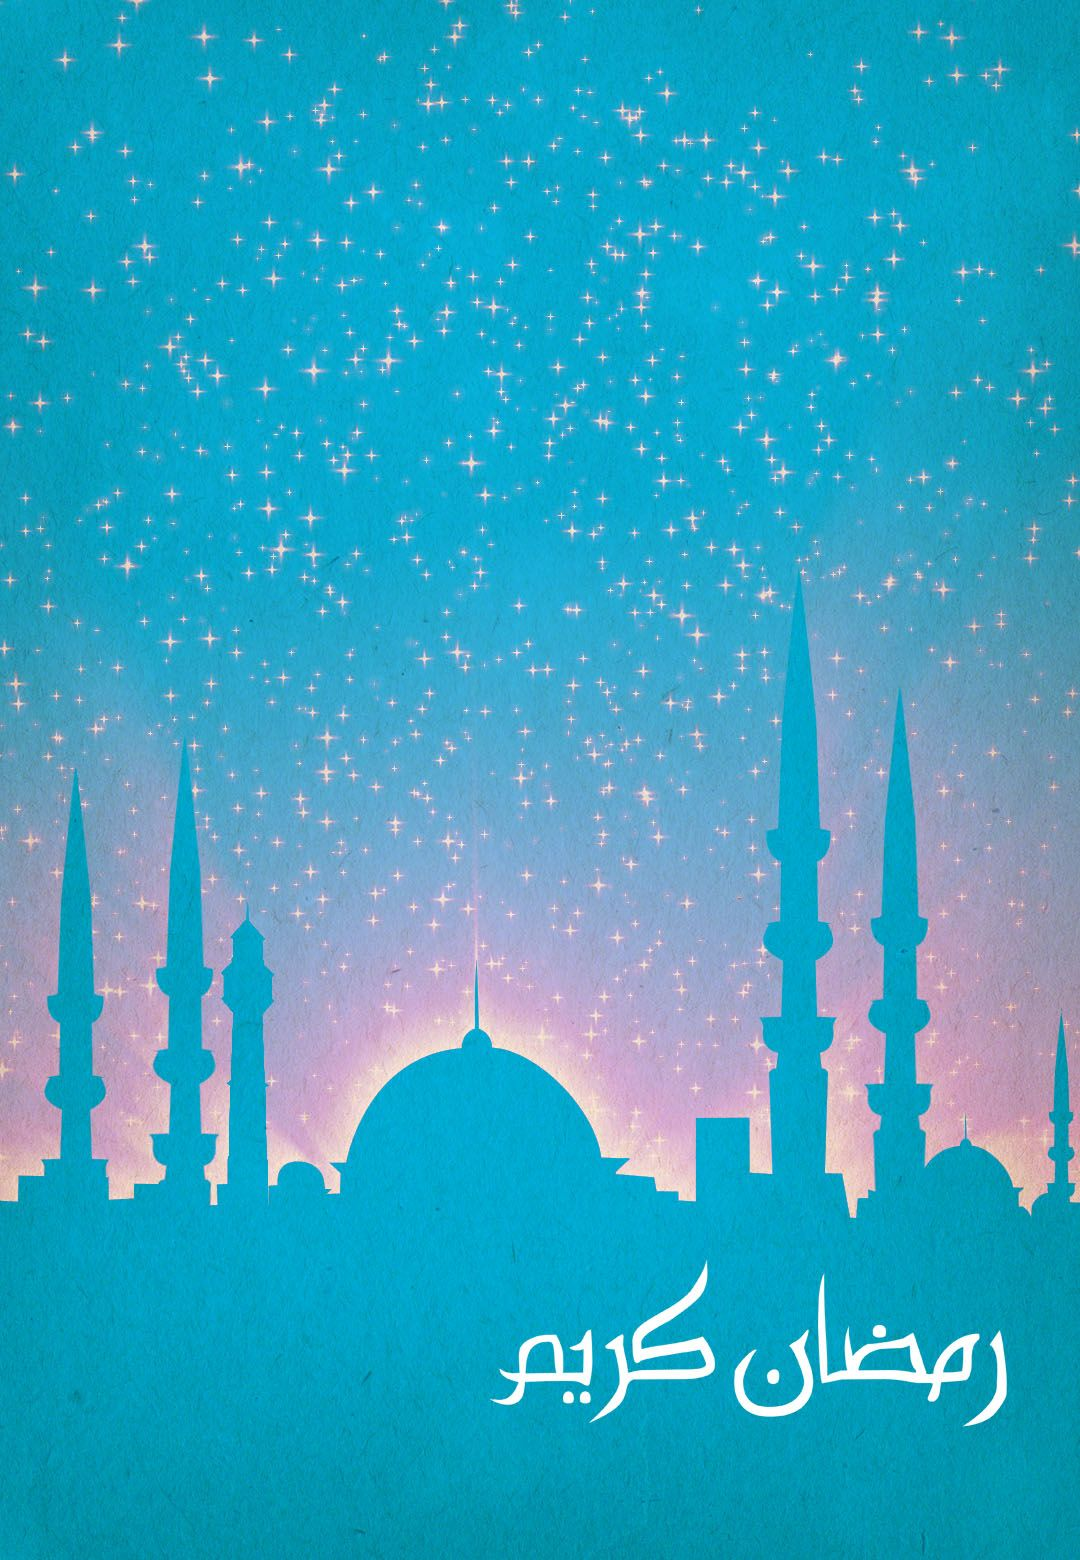 Ramadan Mubarak To Everyone Hr Department Iqvis Ramadan